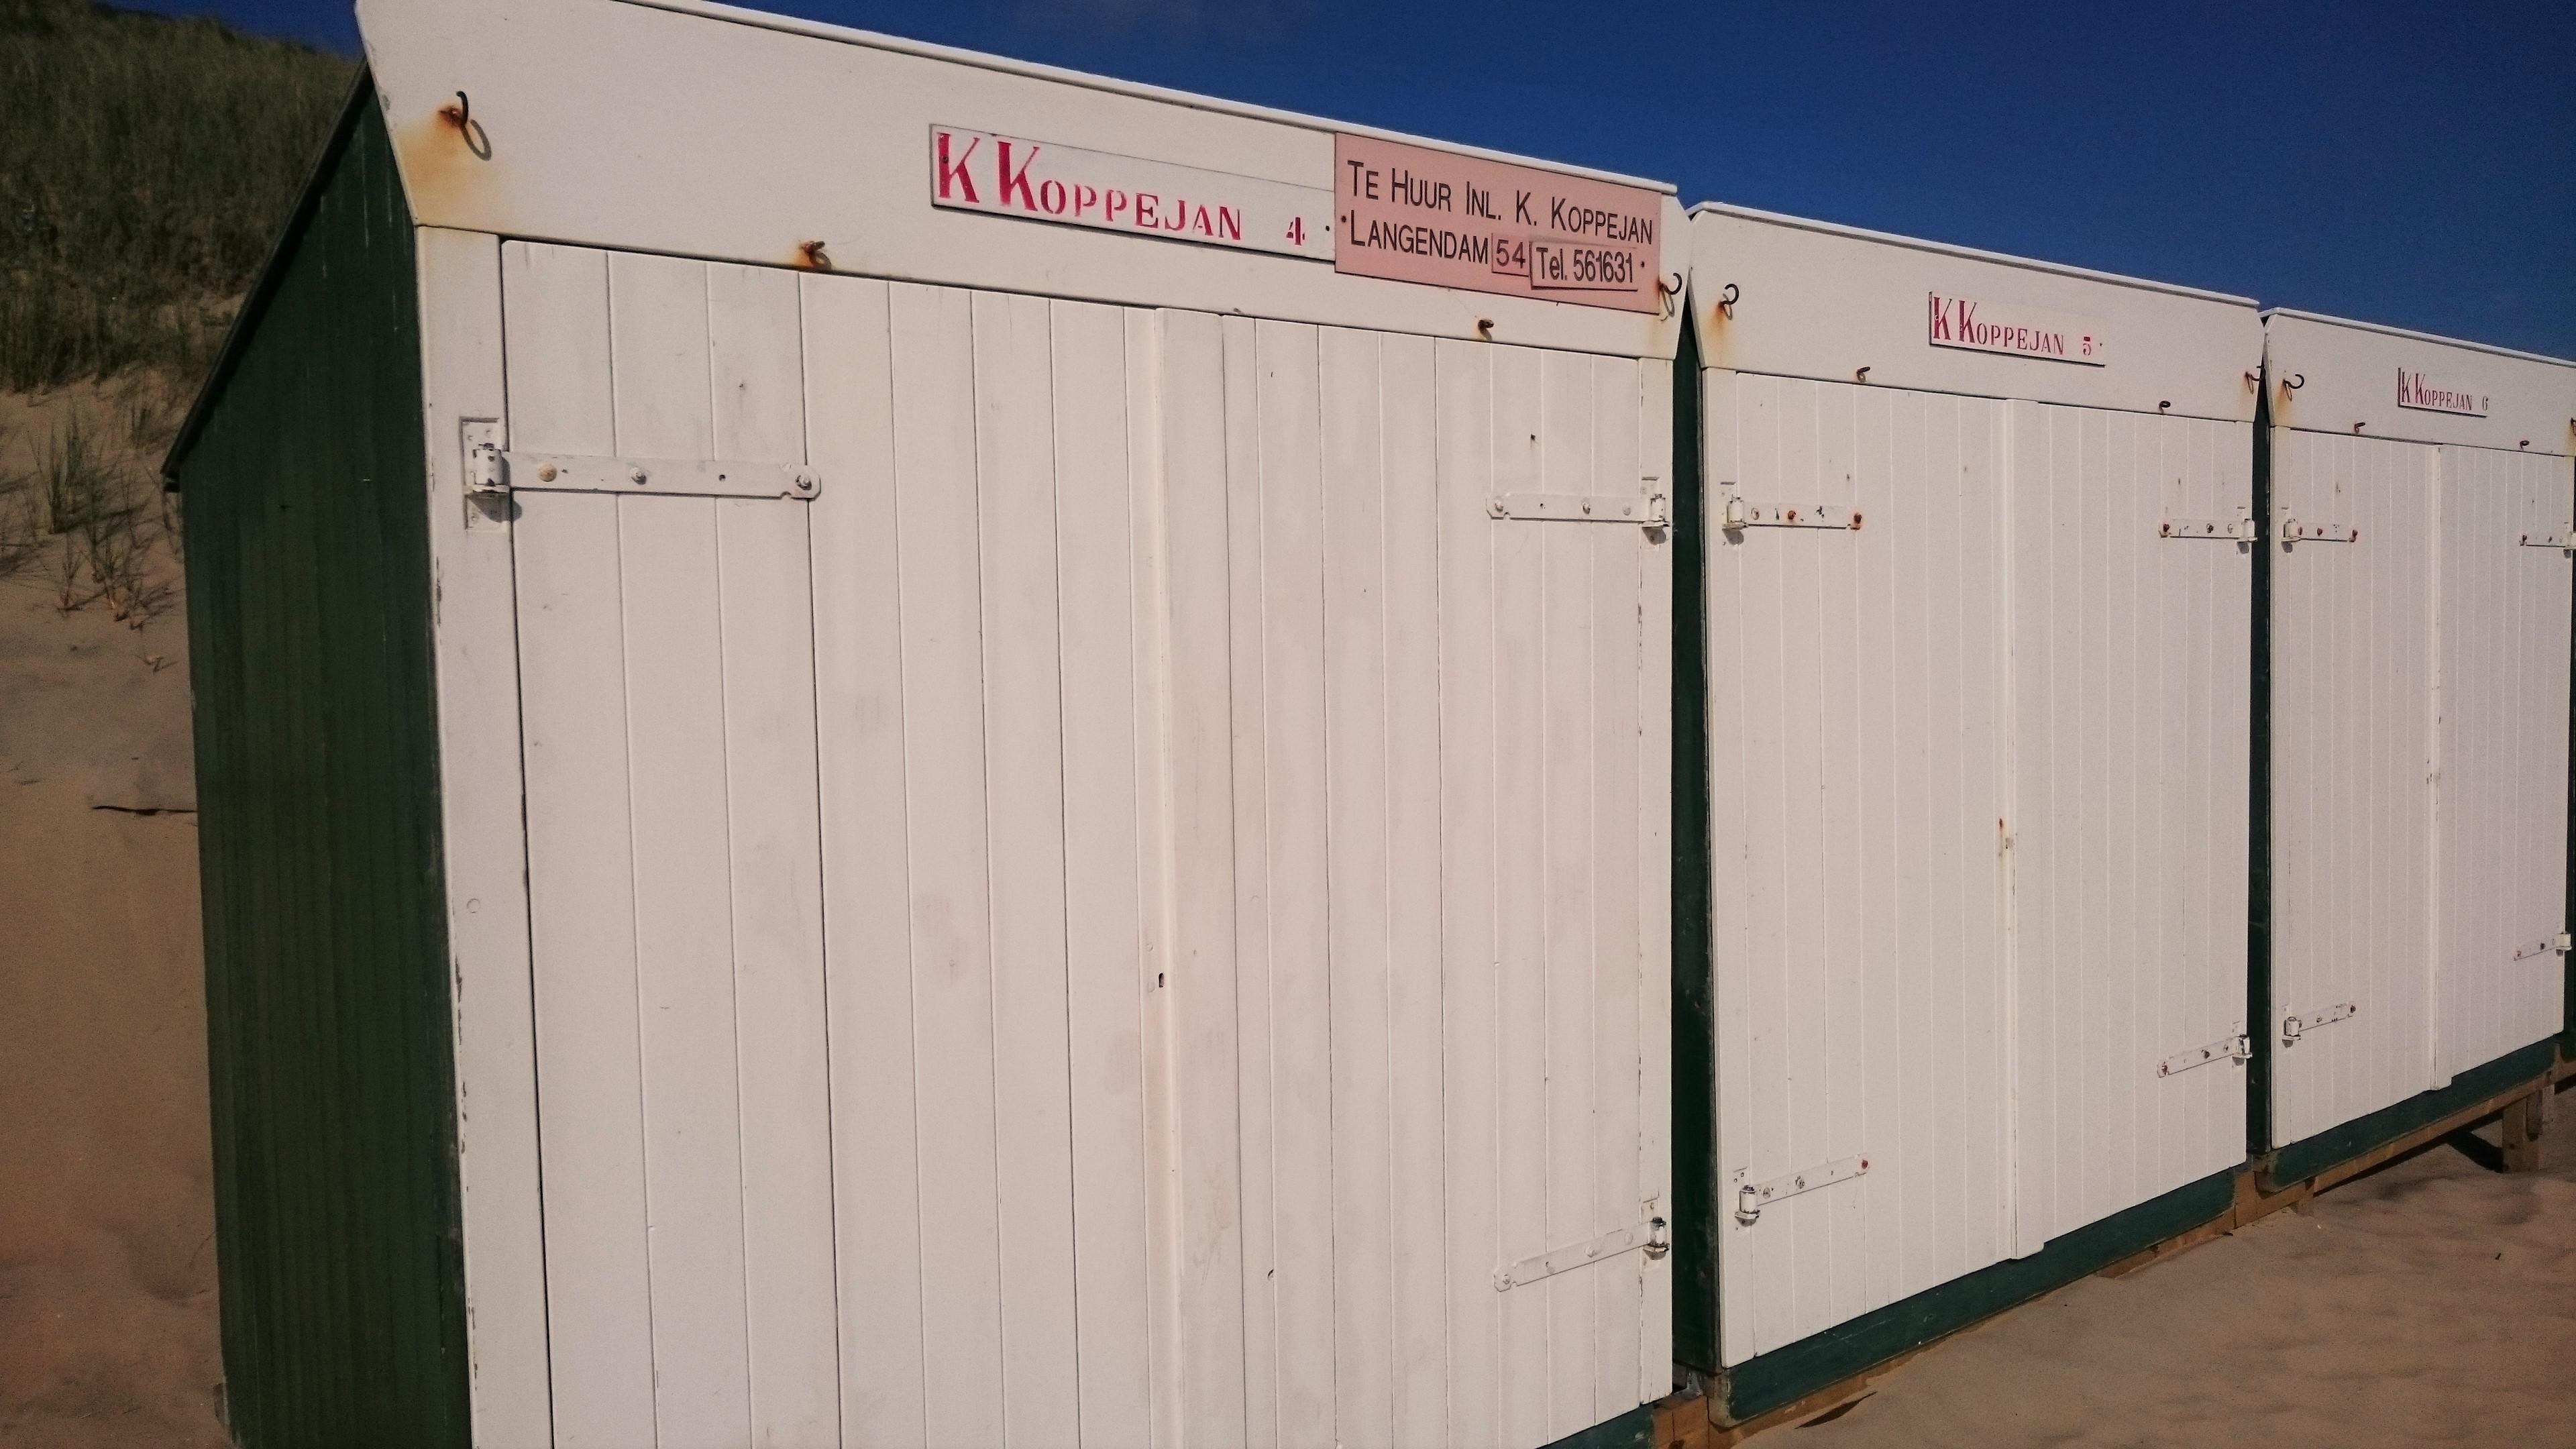 K. Koppejan strandhuisjesverhuur | strandhuisjes.com